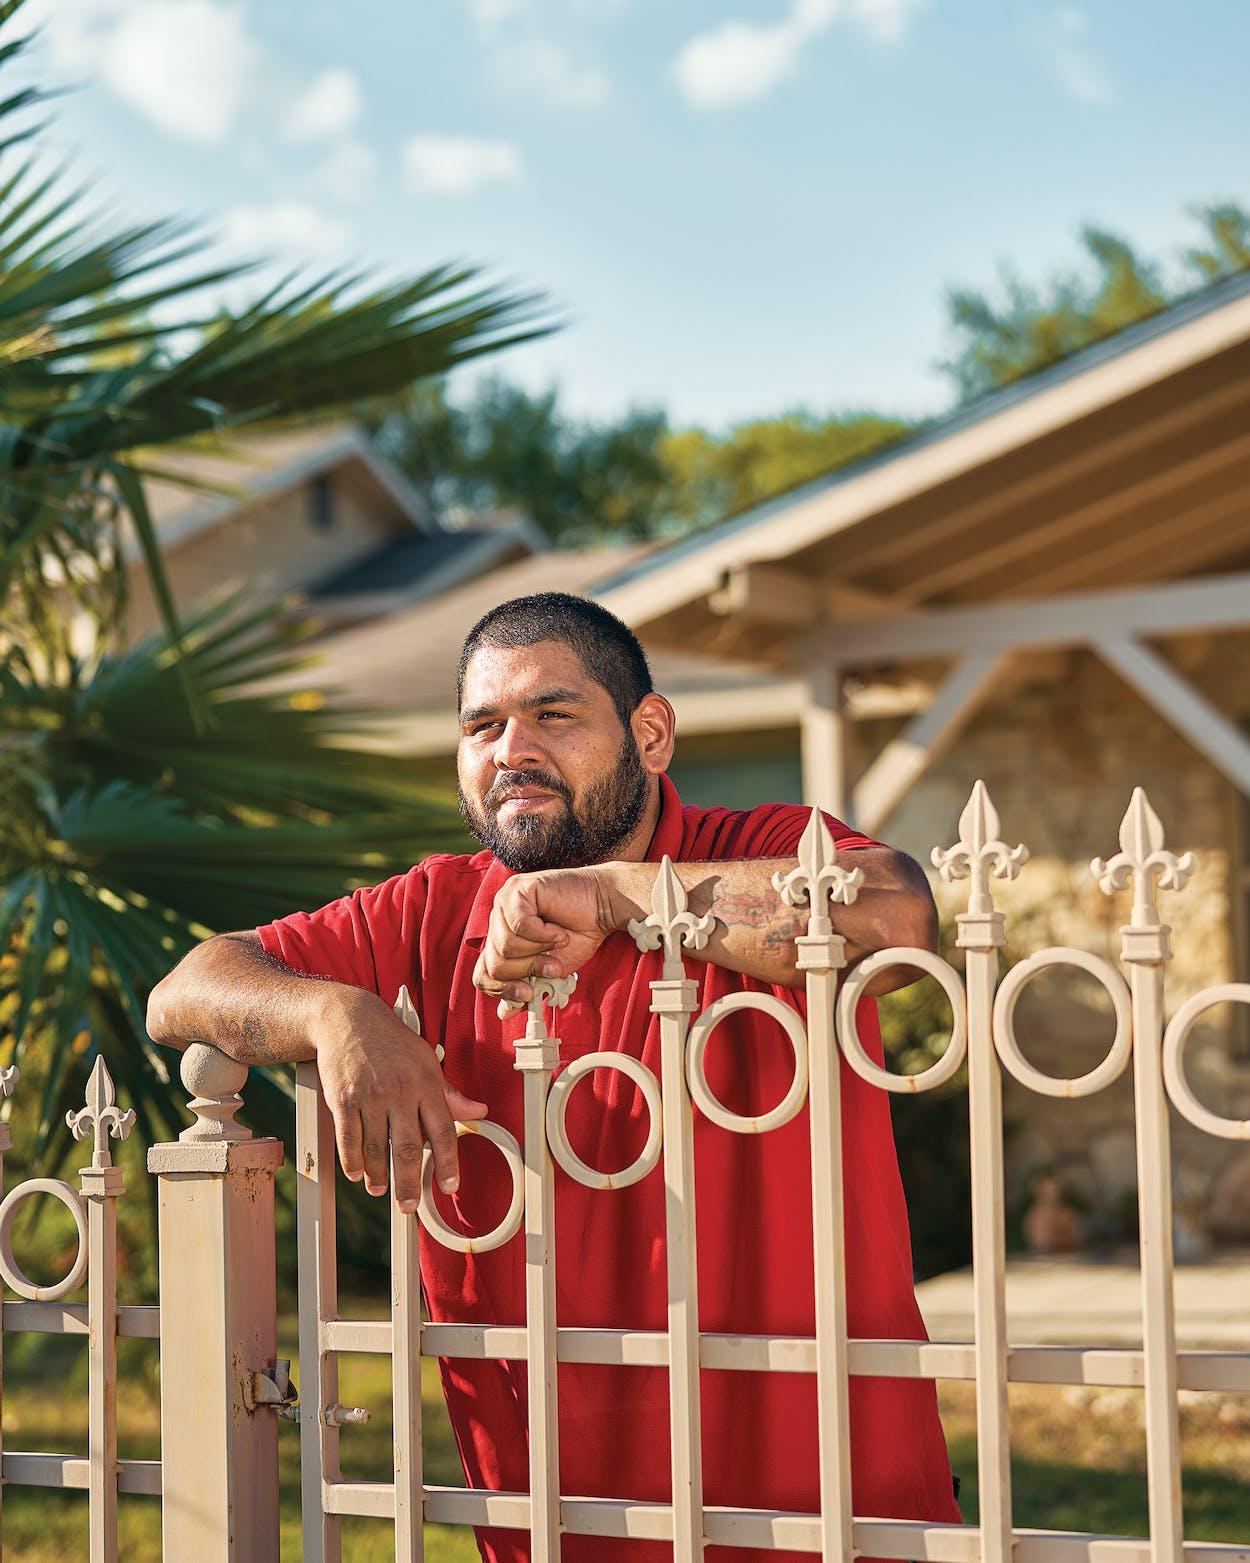 Peter Guzman outside his home in San Antonio on September 25, 2020.